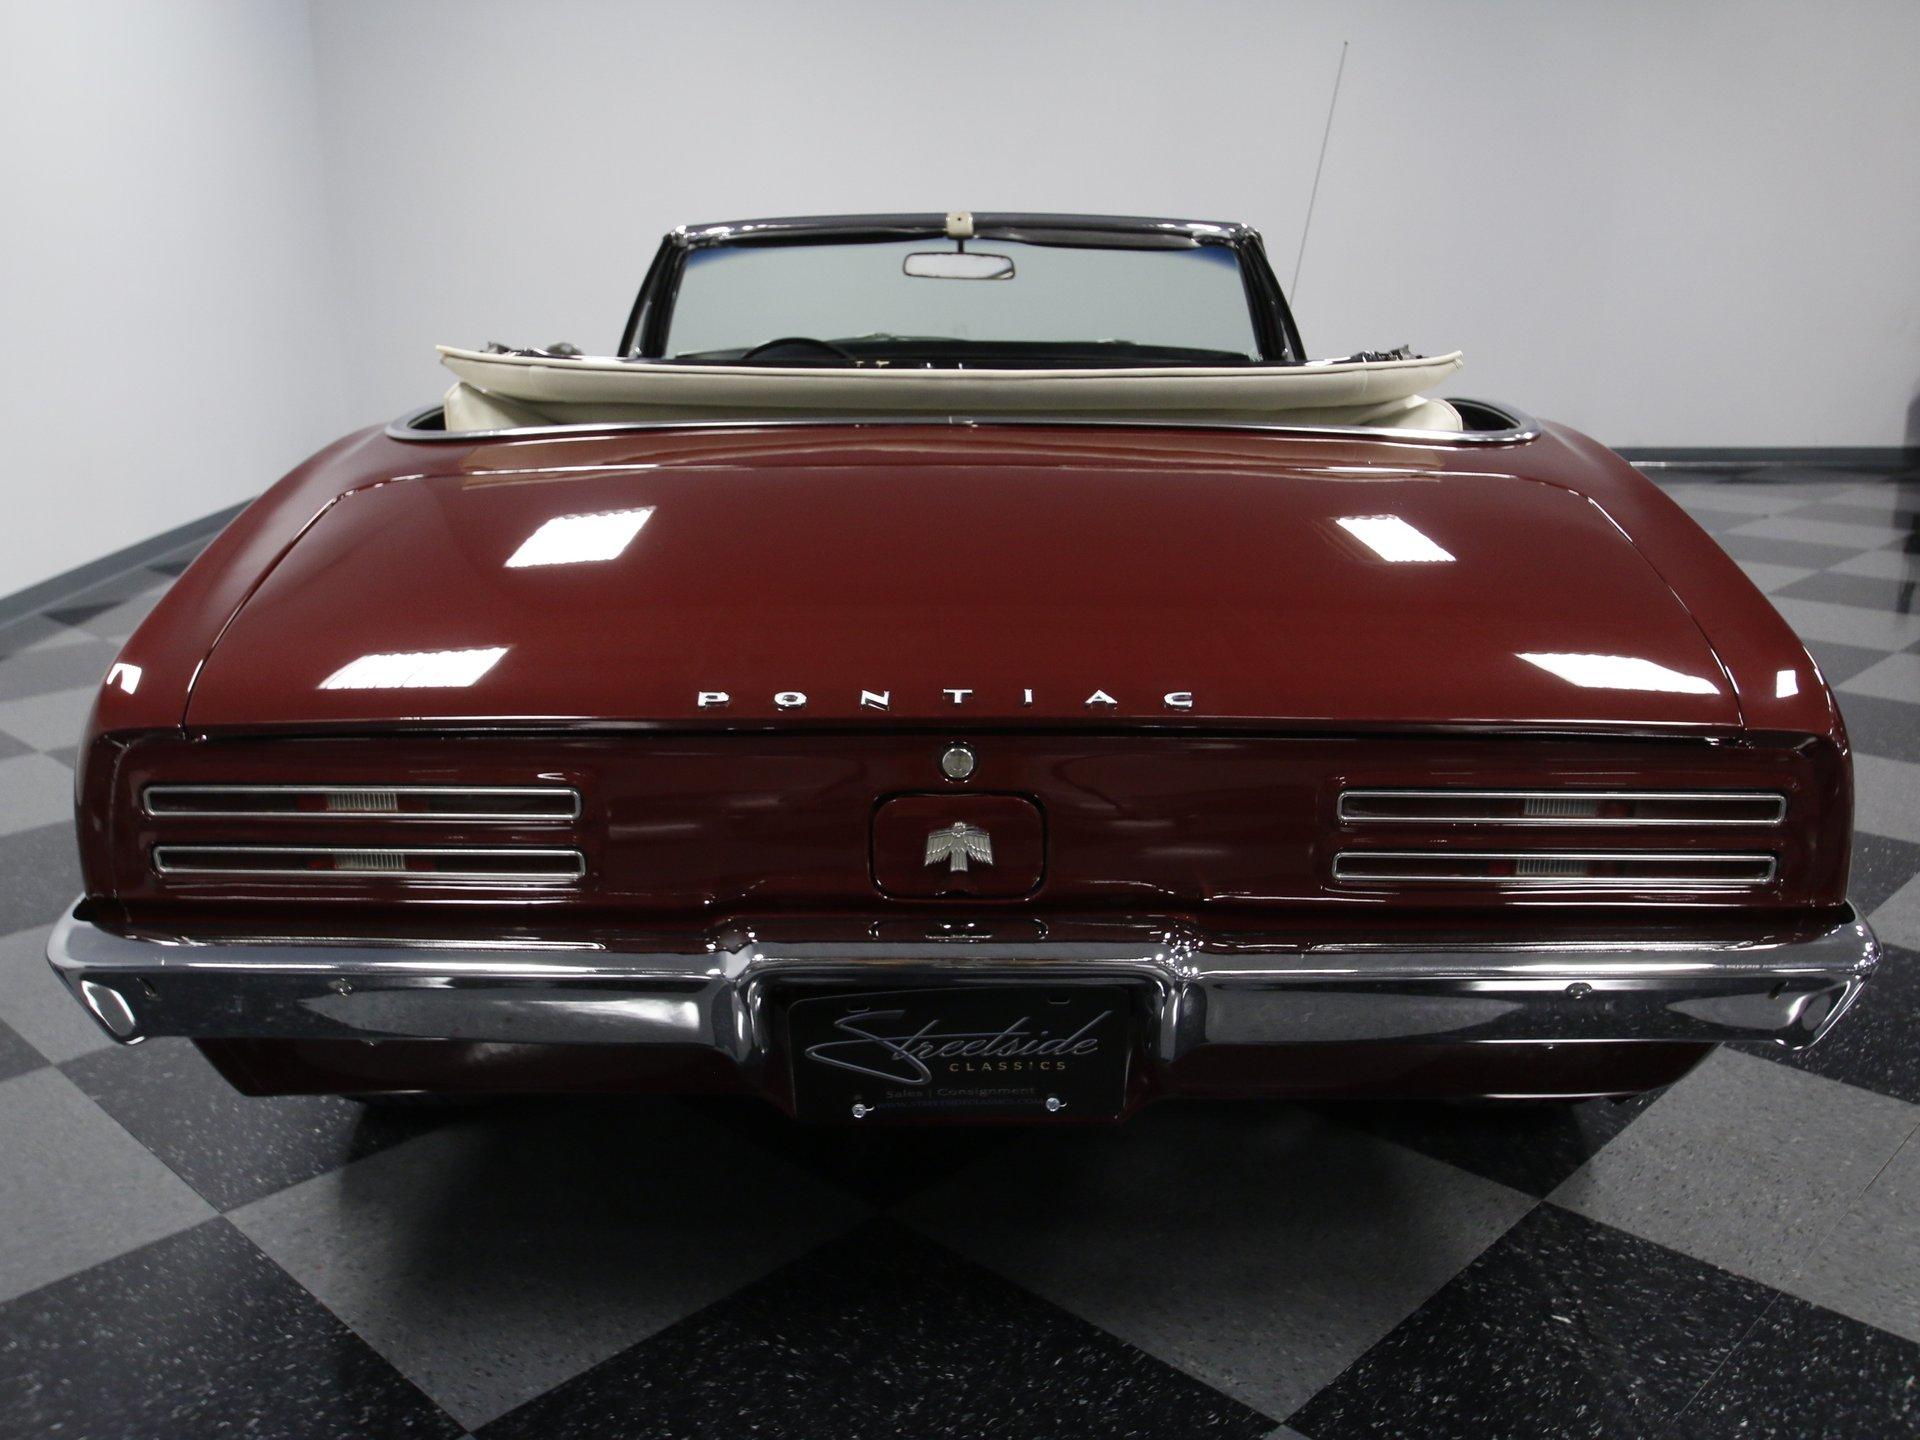 1967 Pontiac Firebird   Berlin Motors